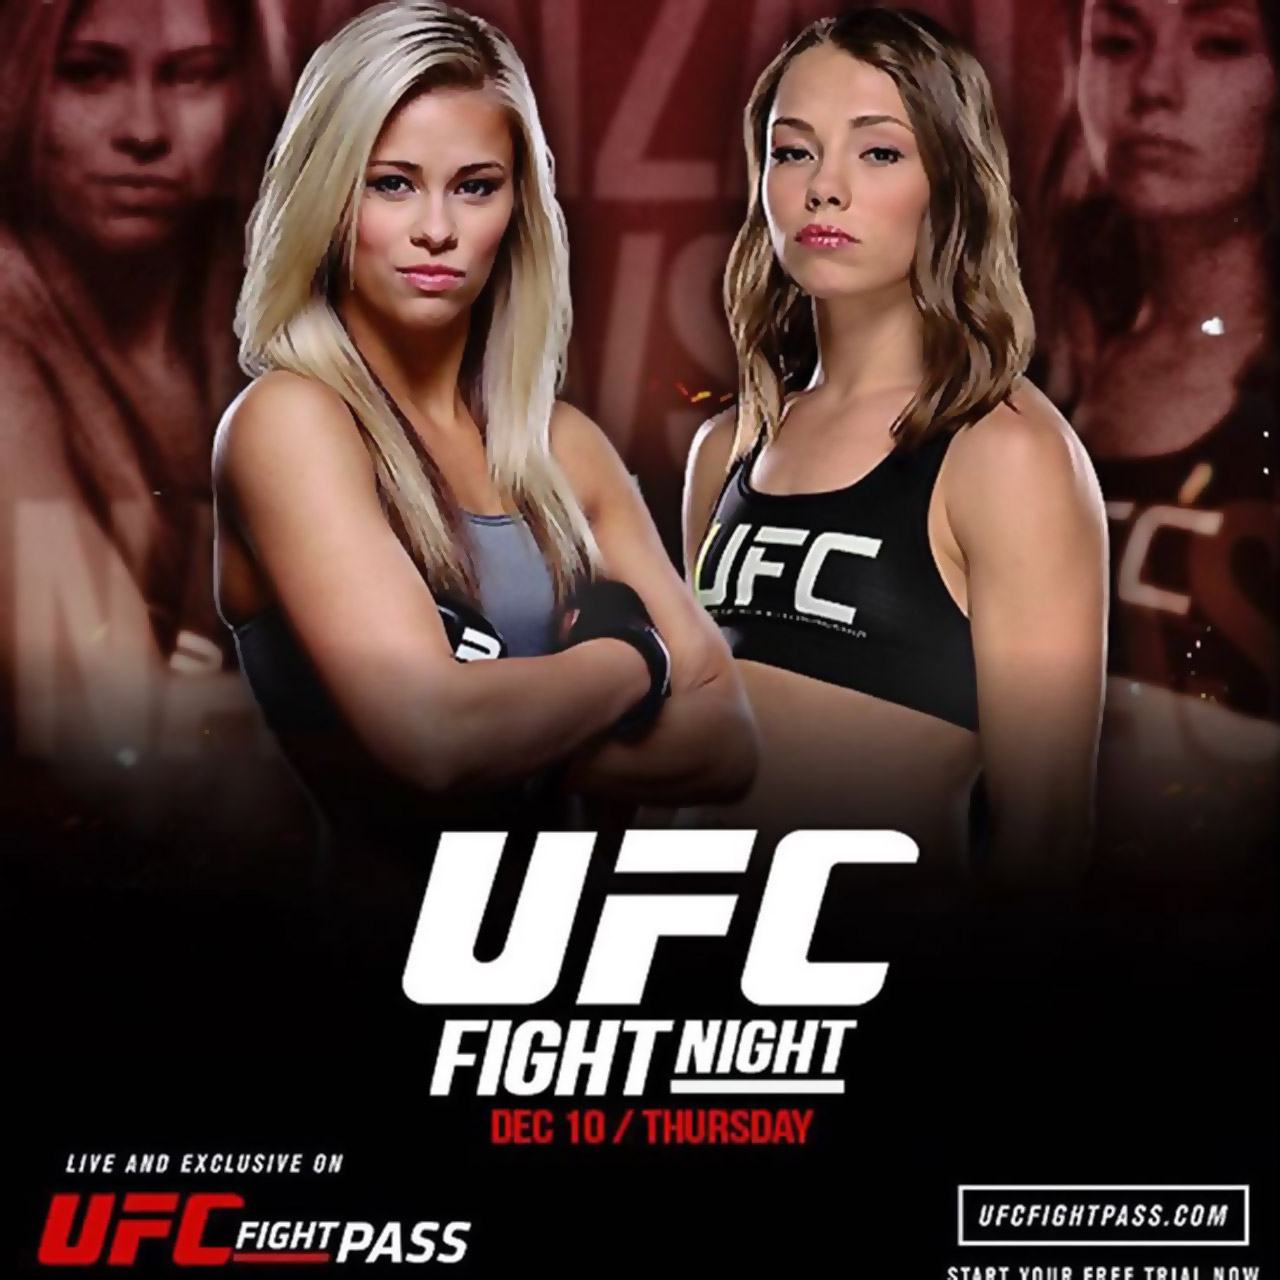 Rose Namajunas vs Paige VanZant at UFC Fight Night 80